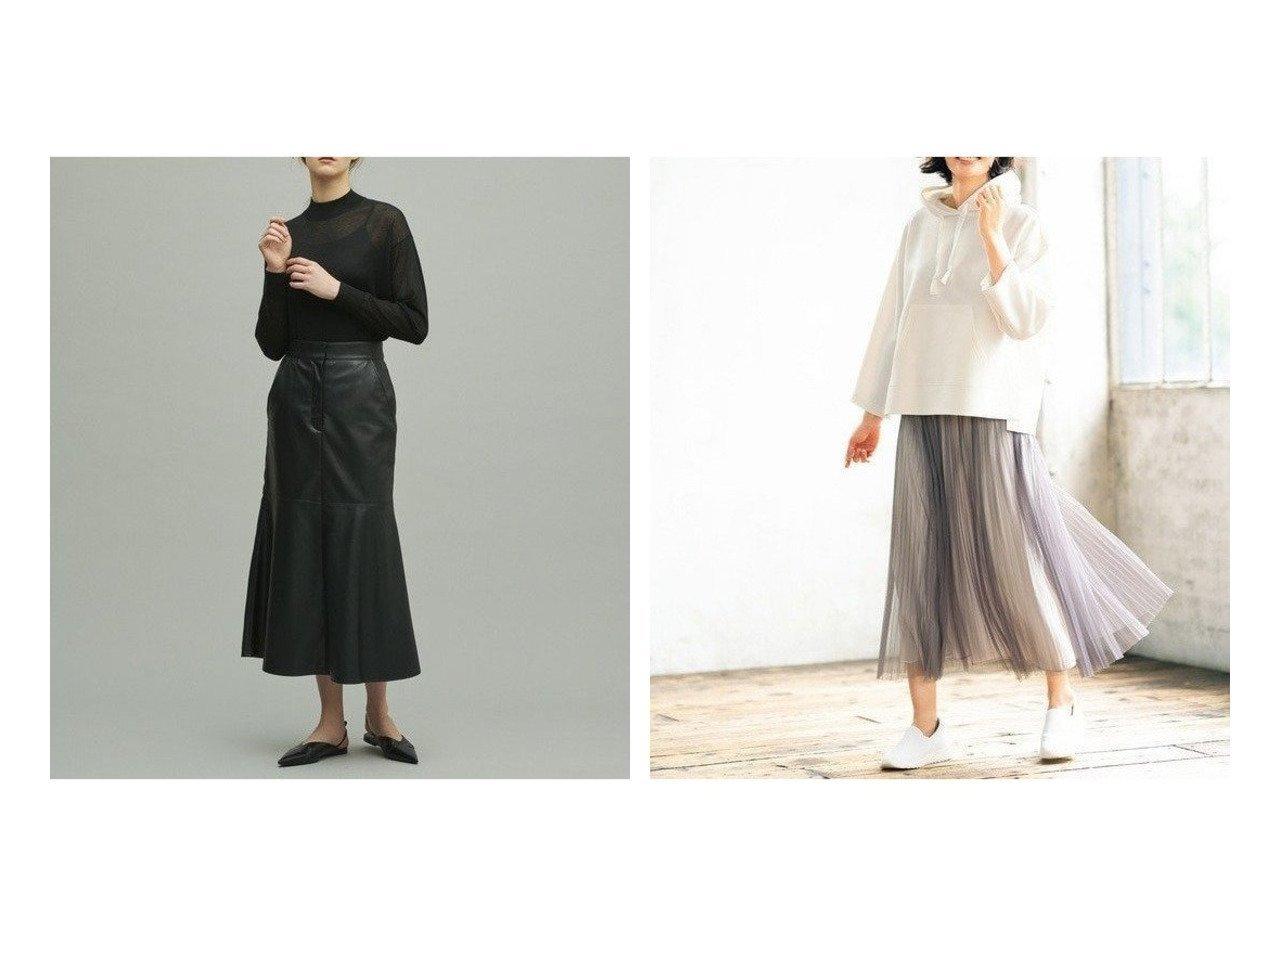 【uncrave/アンクレイヴ】の【追加生産】エコレザー マーメイドスカート&【JIYU-KU/自由区】の【UNFILO】チュール&サテン リバーシブルスカート スカートのおすすめ!人気、レディースファッションの通販 おすすめで人気のファッション通販商品 インテリア・家具・キッズファッション・メンズファッション・レディースファッション・服の通販 founy(ファニー) https://founy.com/ ファッション Fashion レディース WOMEN スカート Skirt ストレッチ フェイクレザー マーメイド リアル オーガンジー ギャザー サテン チュール フィット プリーツ  ID:crp329100000005316